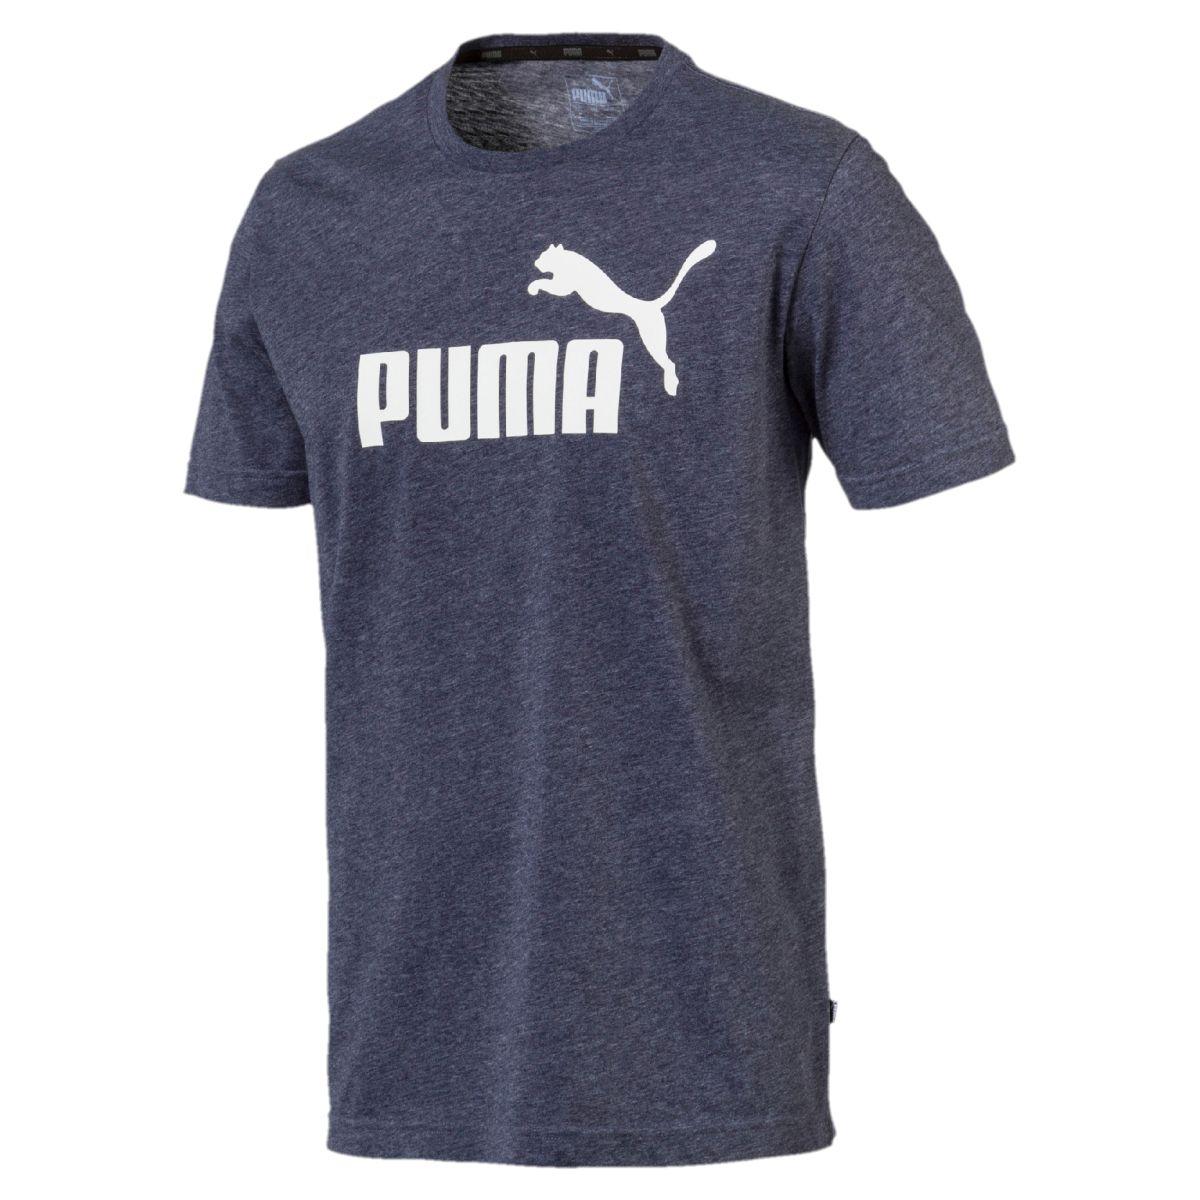 цены на Футболка PUMA Essentials+ Heather Tee  в интернет-магазинах